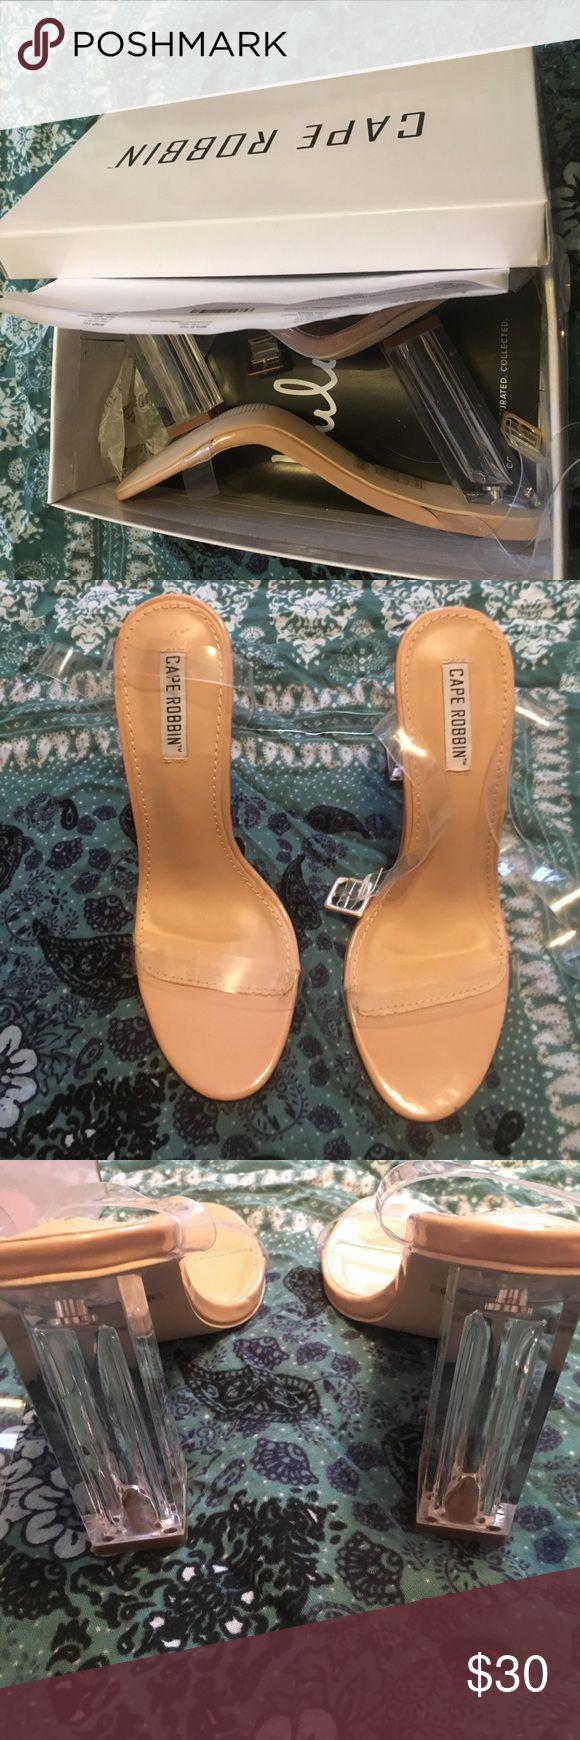 YEEZY LOOK ALIKE HEELS Cleared heels, never worn, purchased from lulus.com #yeezy #kanyewest #trendy #kendalljenner #kyliejenner #kimkardashian #kardashians #jenners Lulu's Shoes Heels